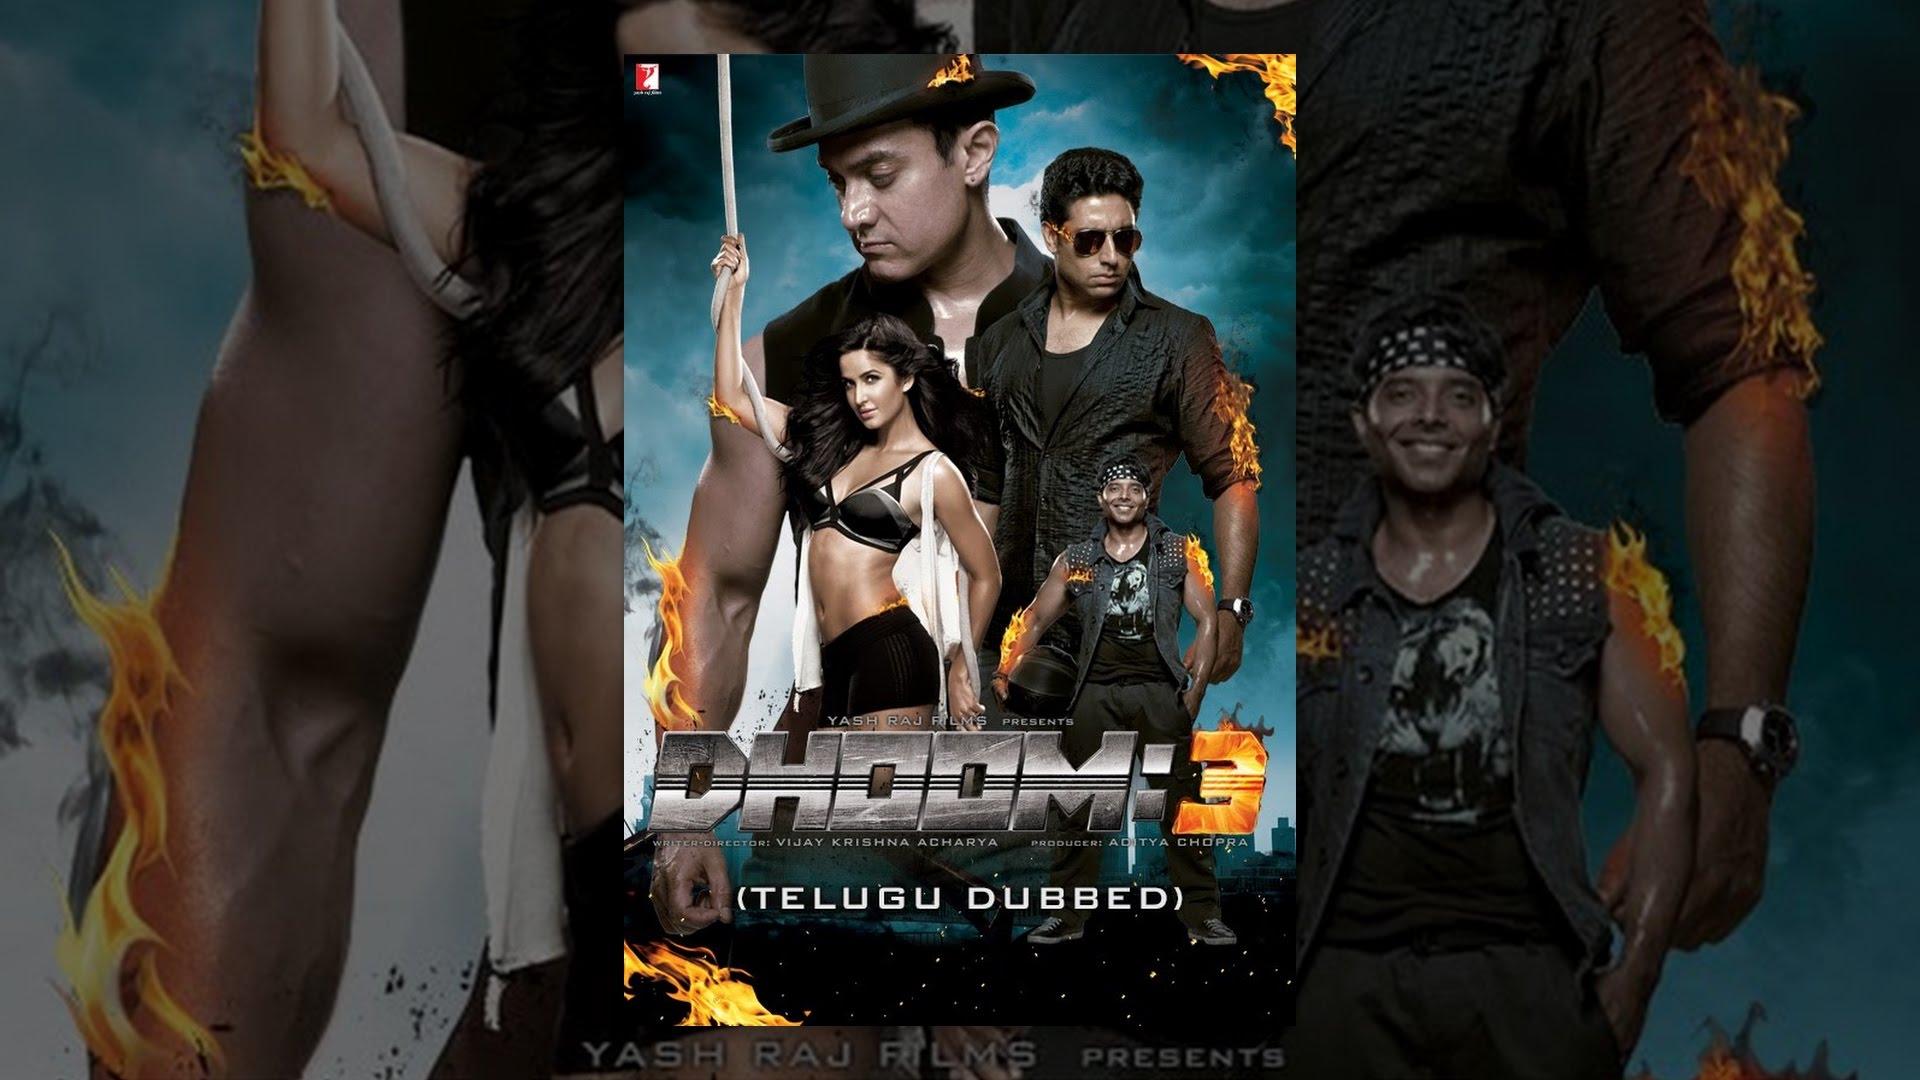 Download DHOOM:3 (Telugu Dubbed)